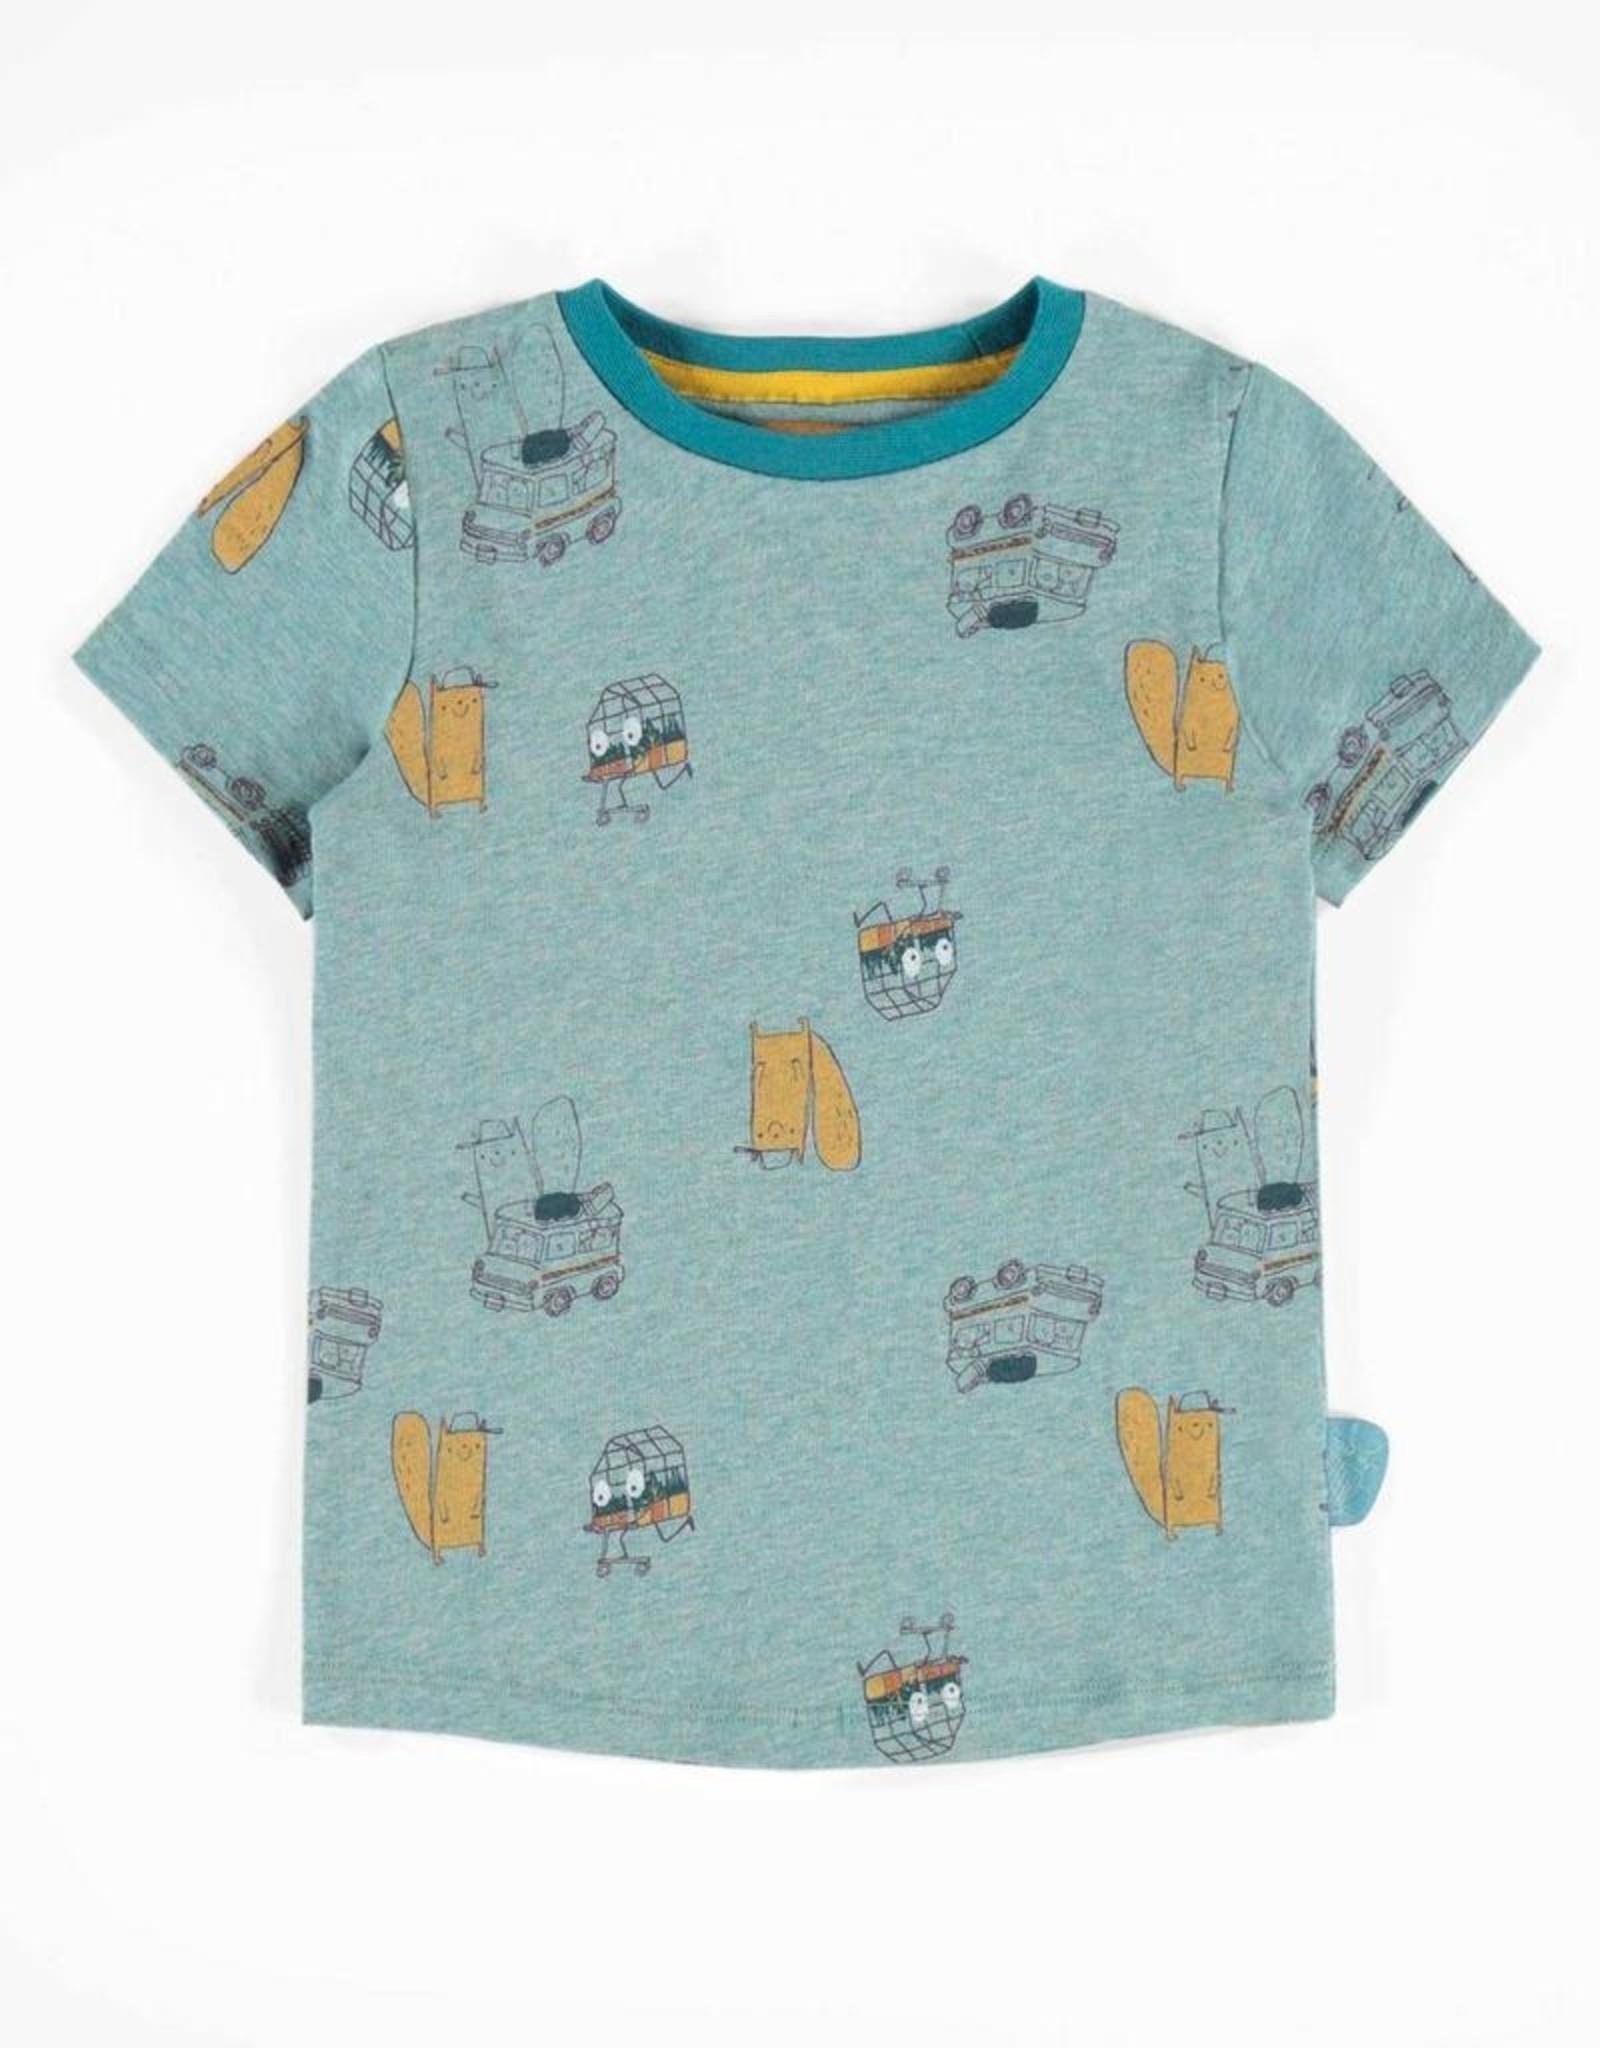 Souris Mini Blue Printed Short-Sleeve T-shirt